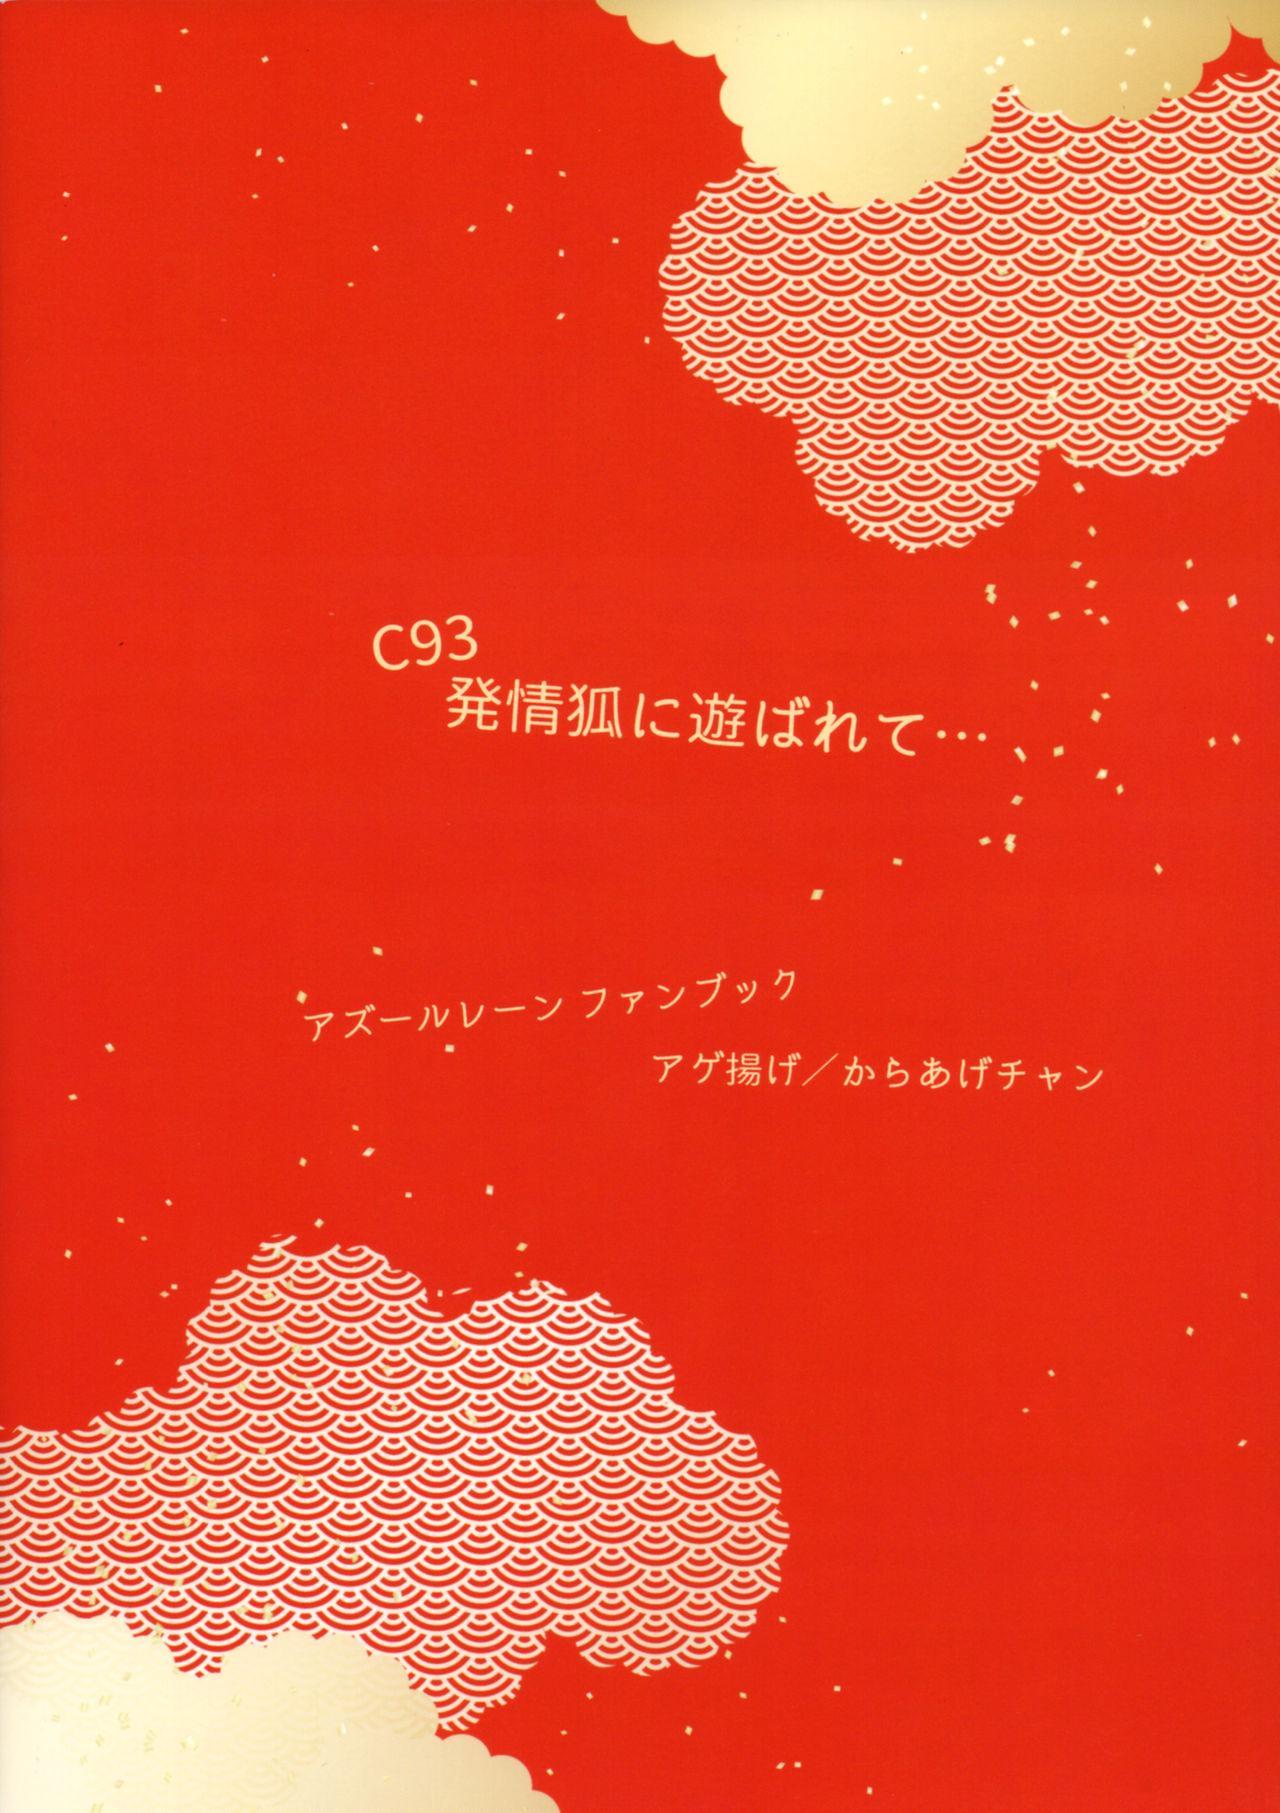 Hatsujou Kitsune ni Asobarete... | Toyed by foxes in heat 17